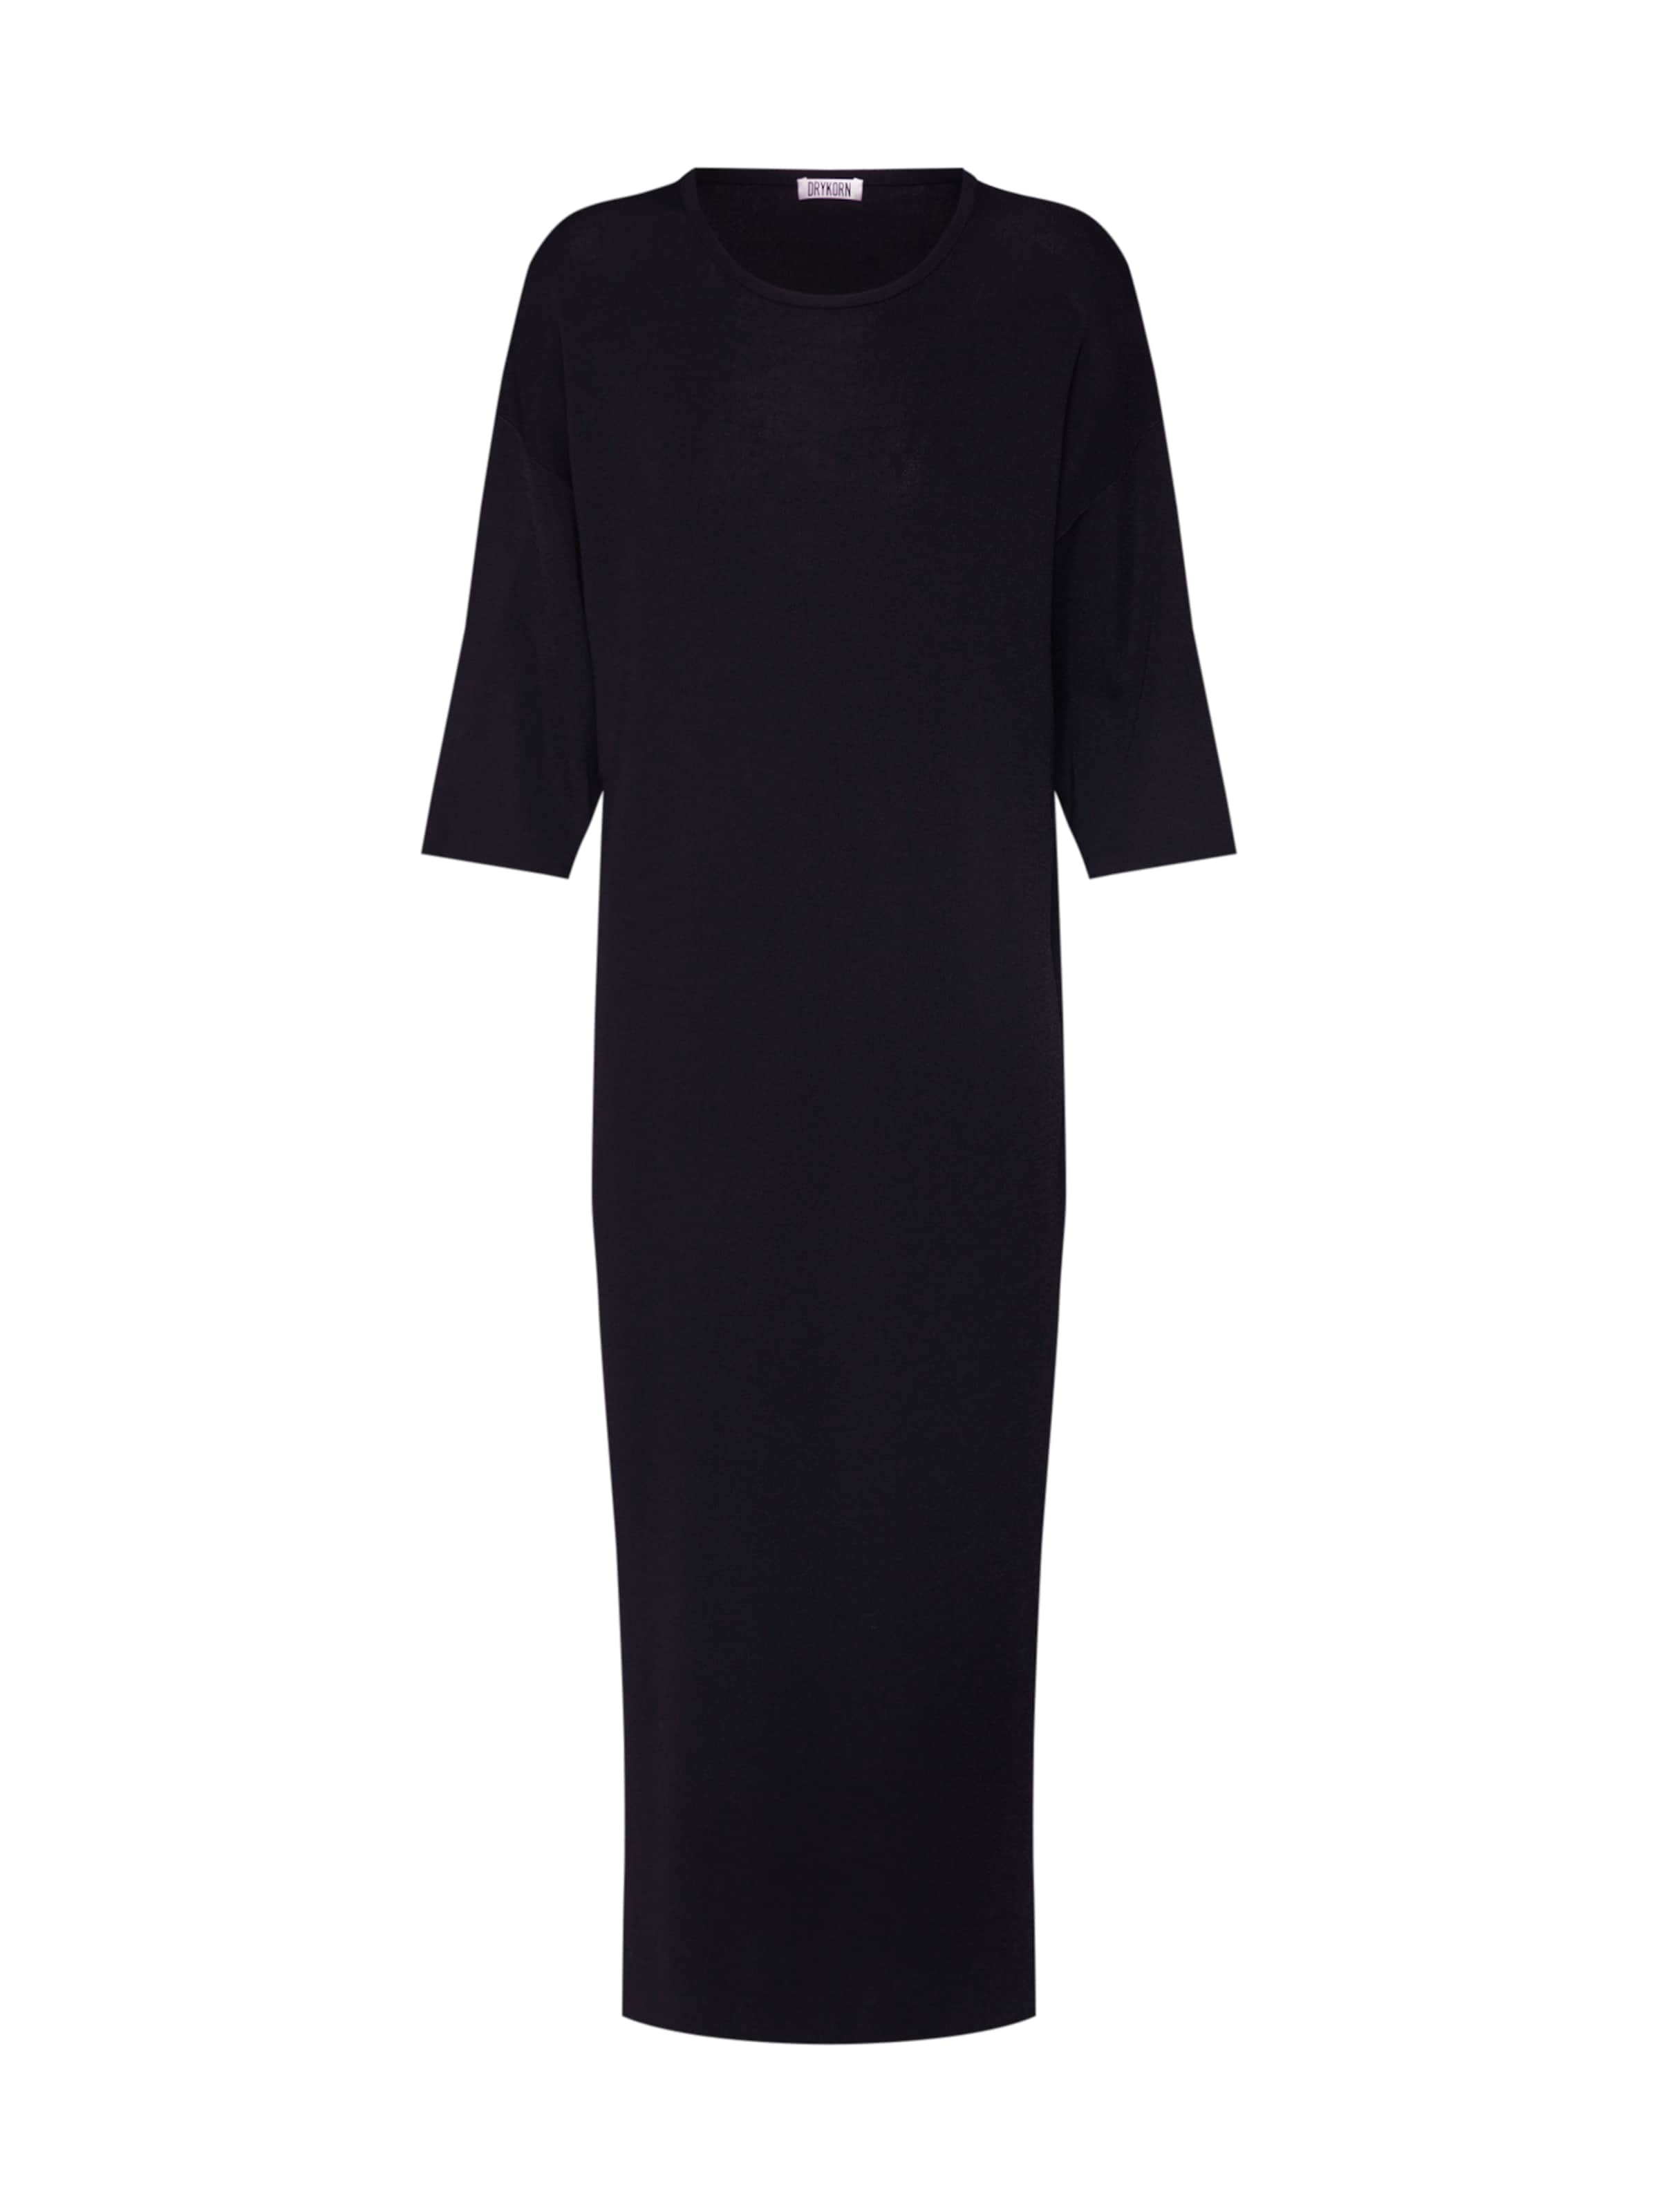 'efta' Robe Noir Drykorn Robe En Drykorn 'efta' En 5LAR4q3j